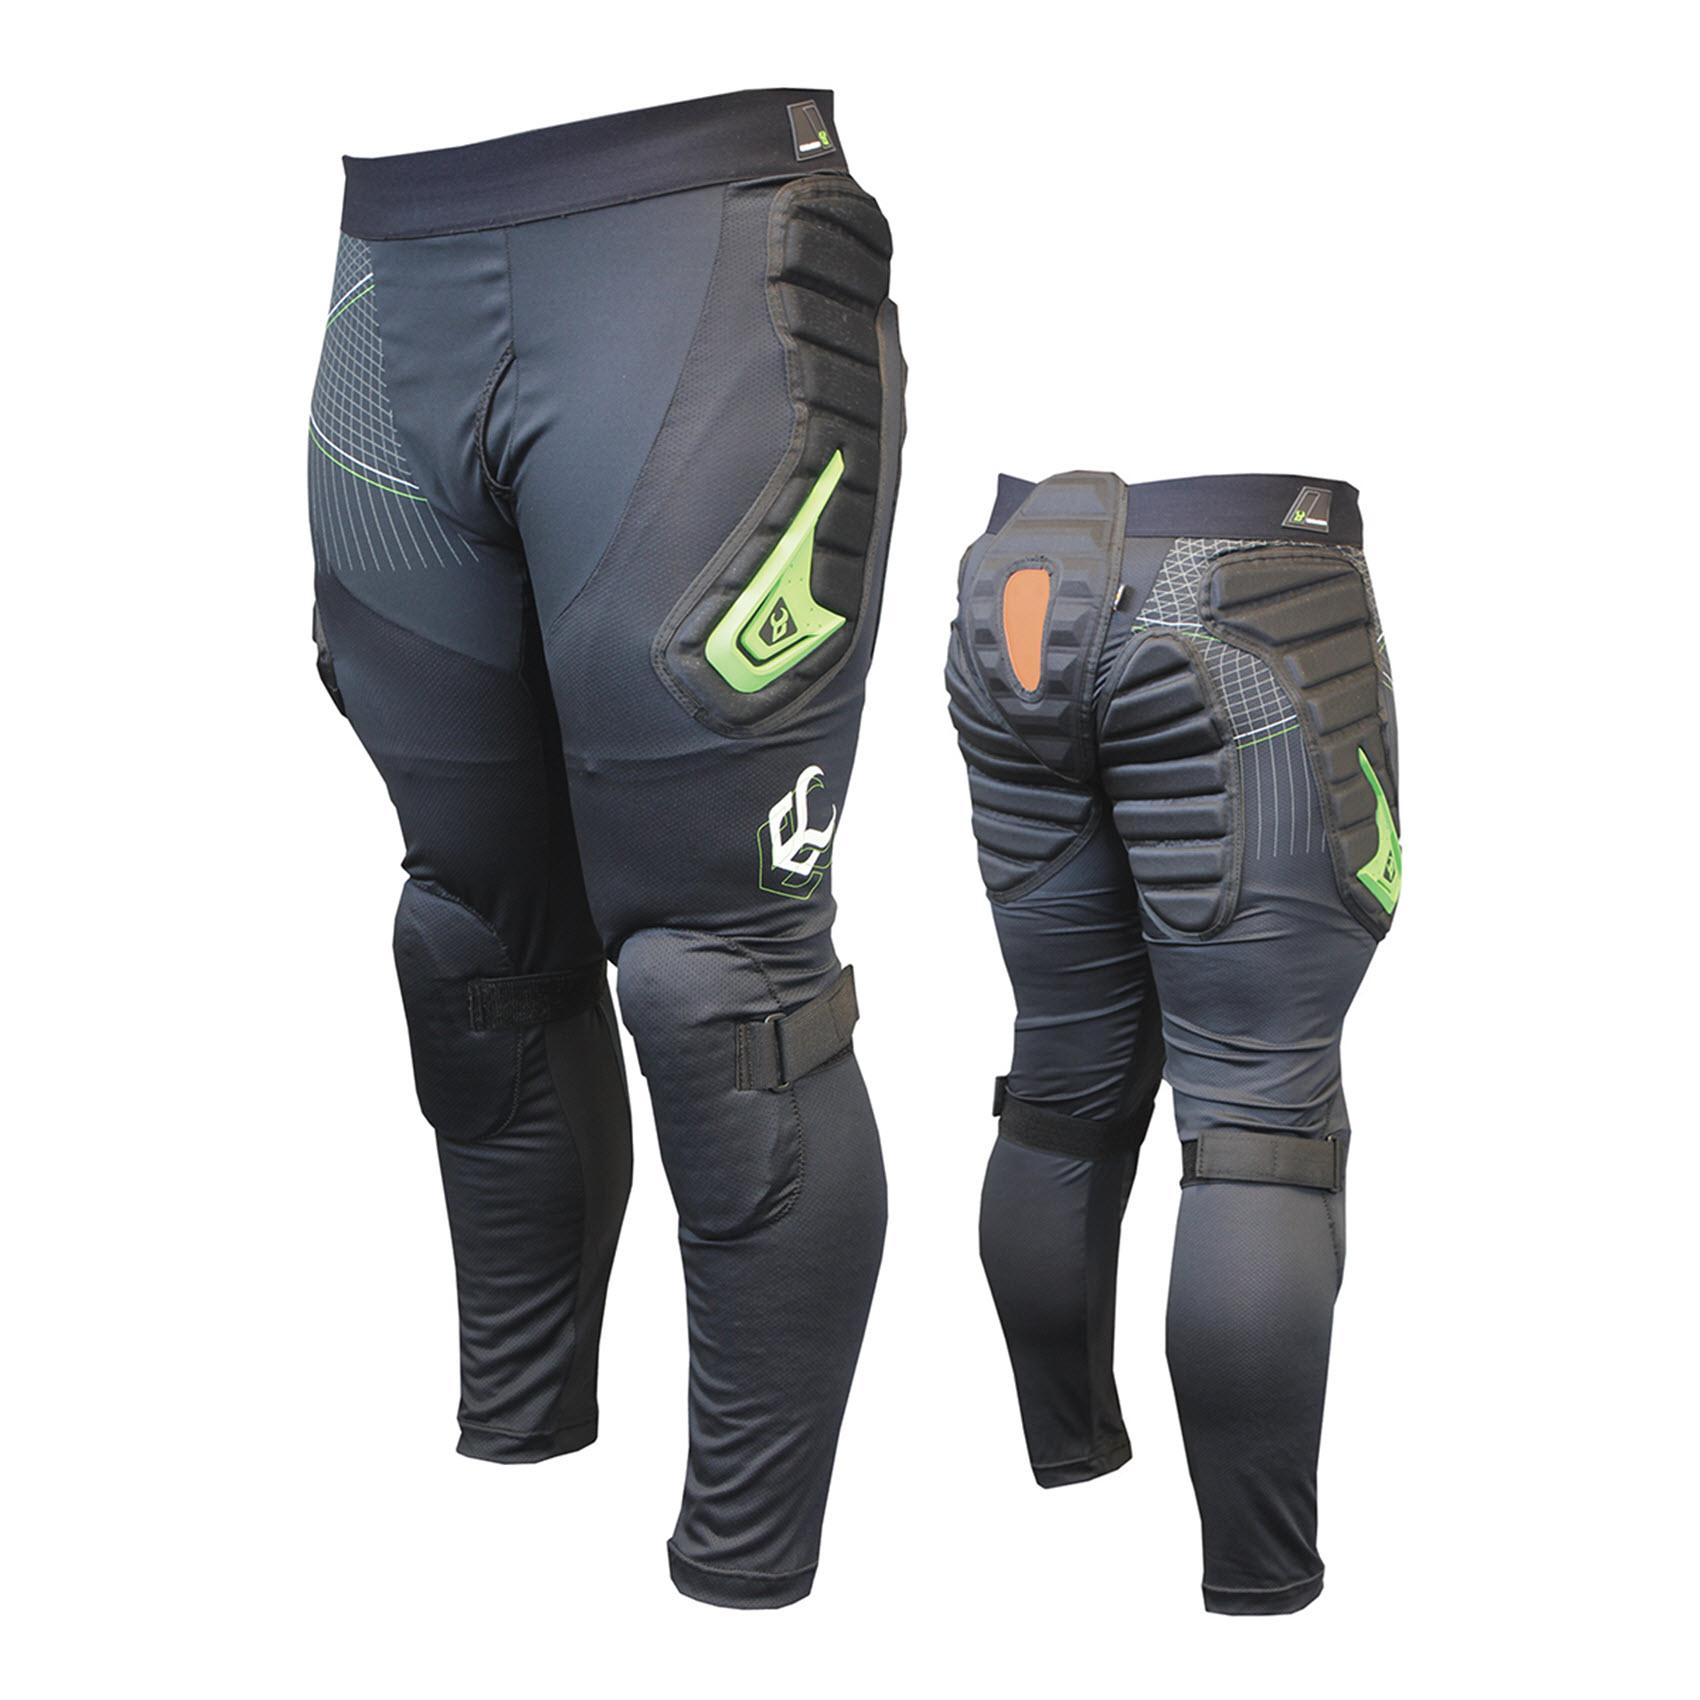 demon flexforce x pants d30 mens snowboard impact shorts. Black Bedroom Furniture Sets. Home Design Ideas